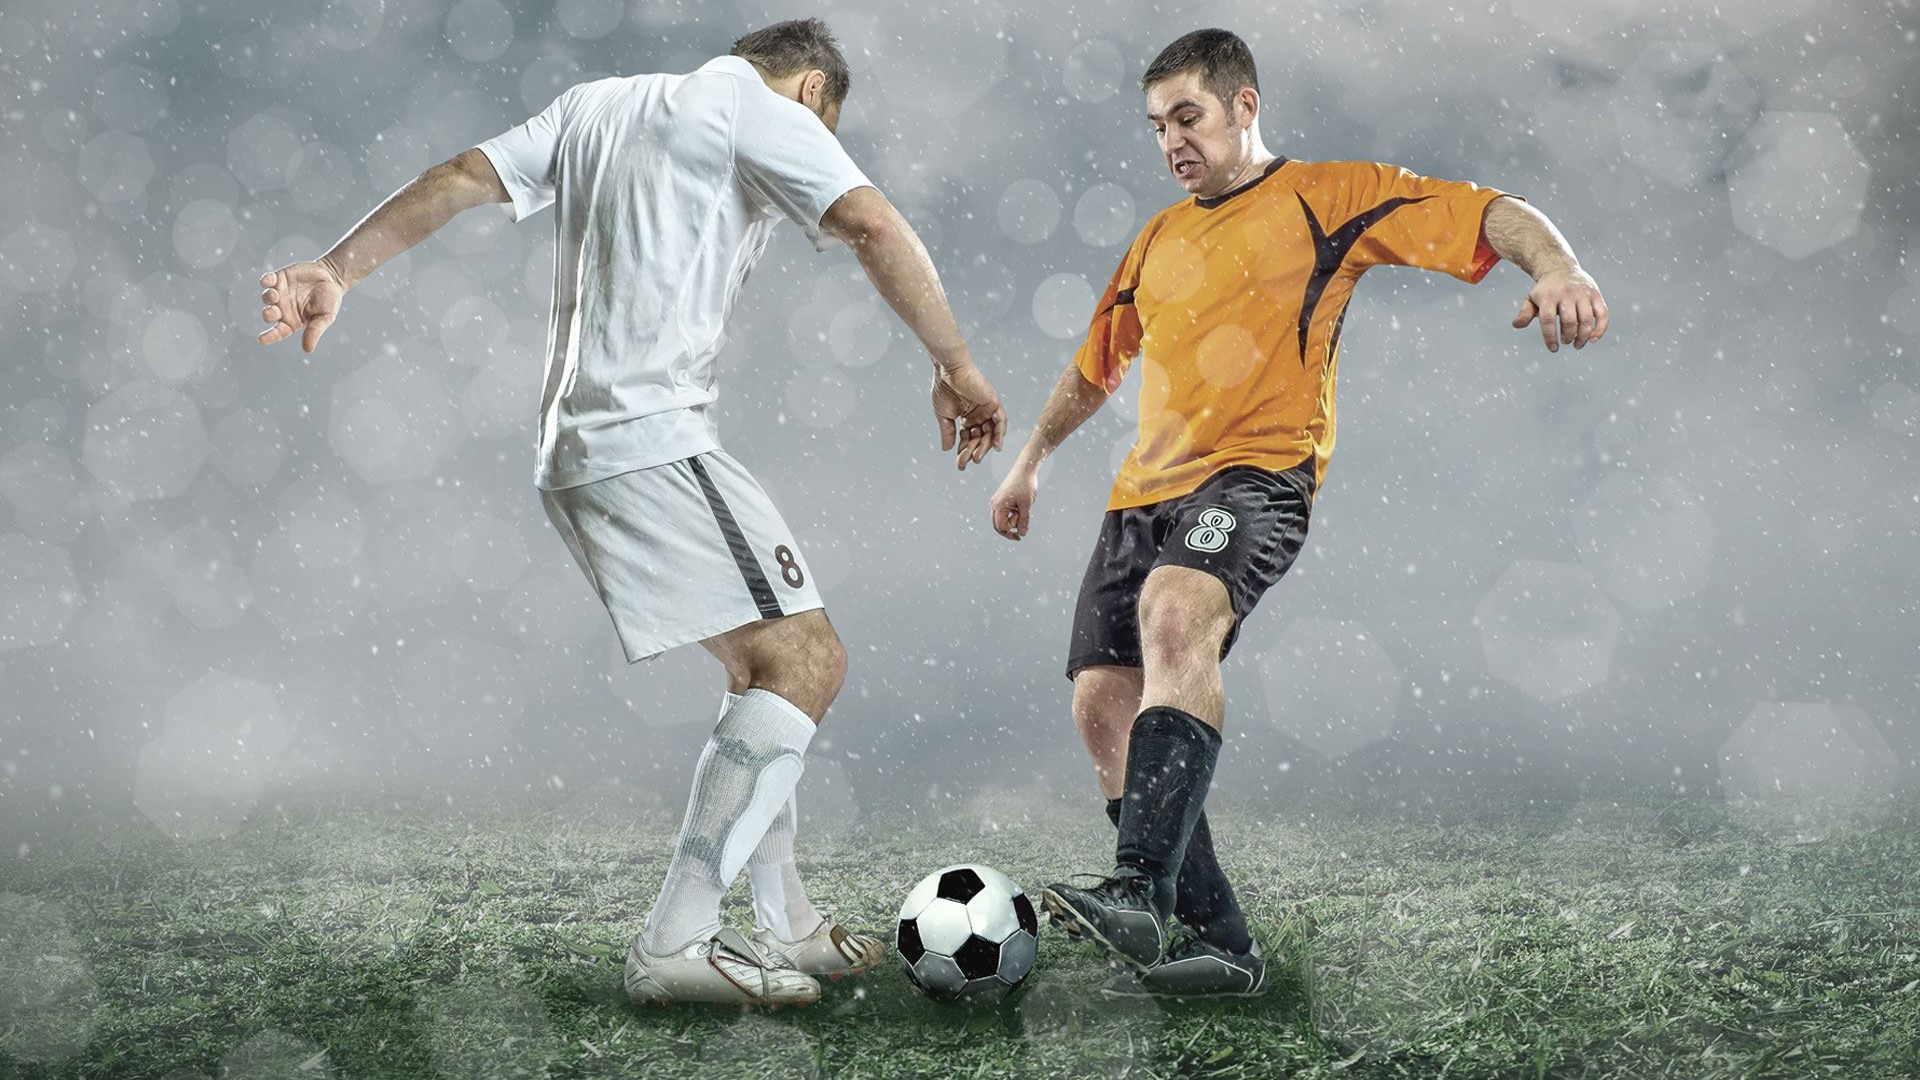 watch-castleford-tigers-vs-huddersfield-giants-live